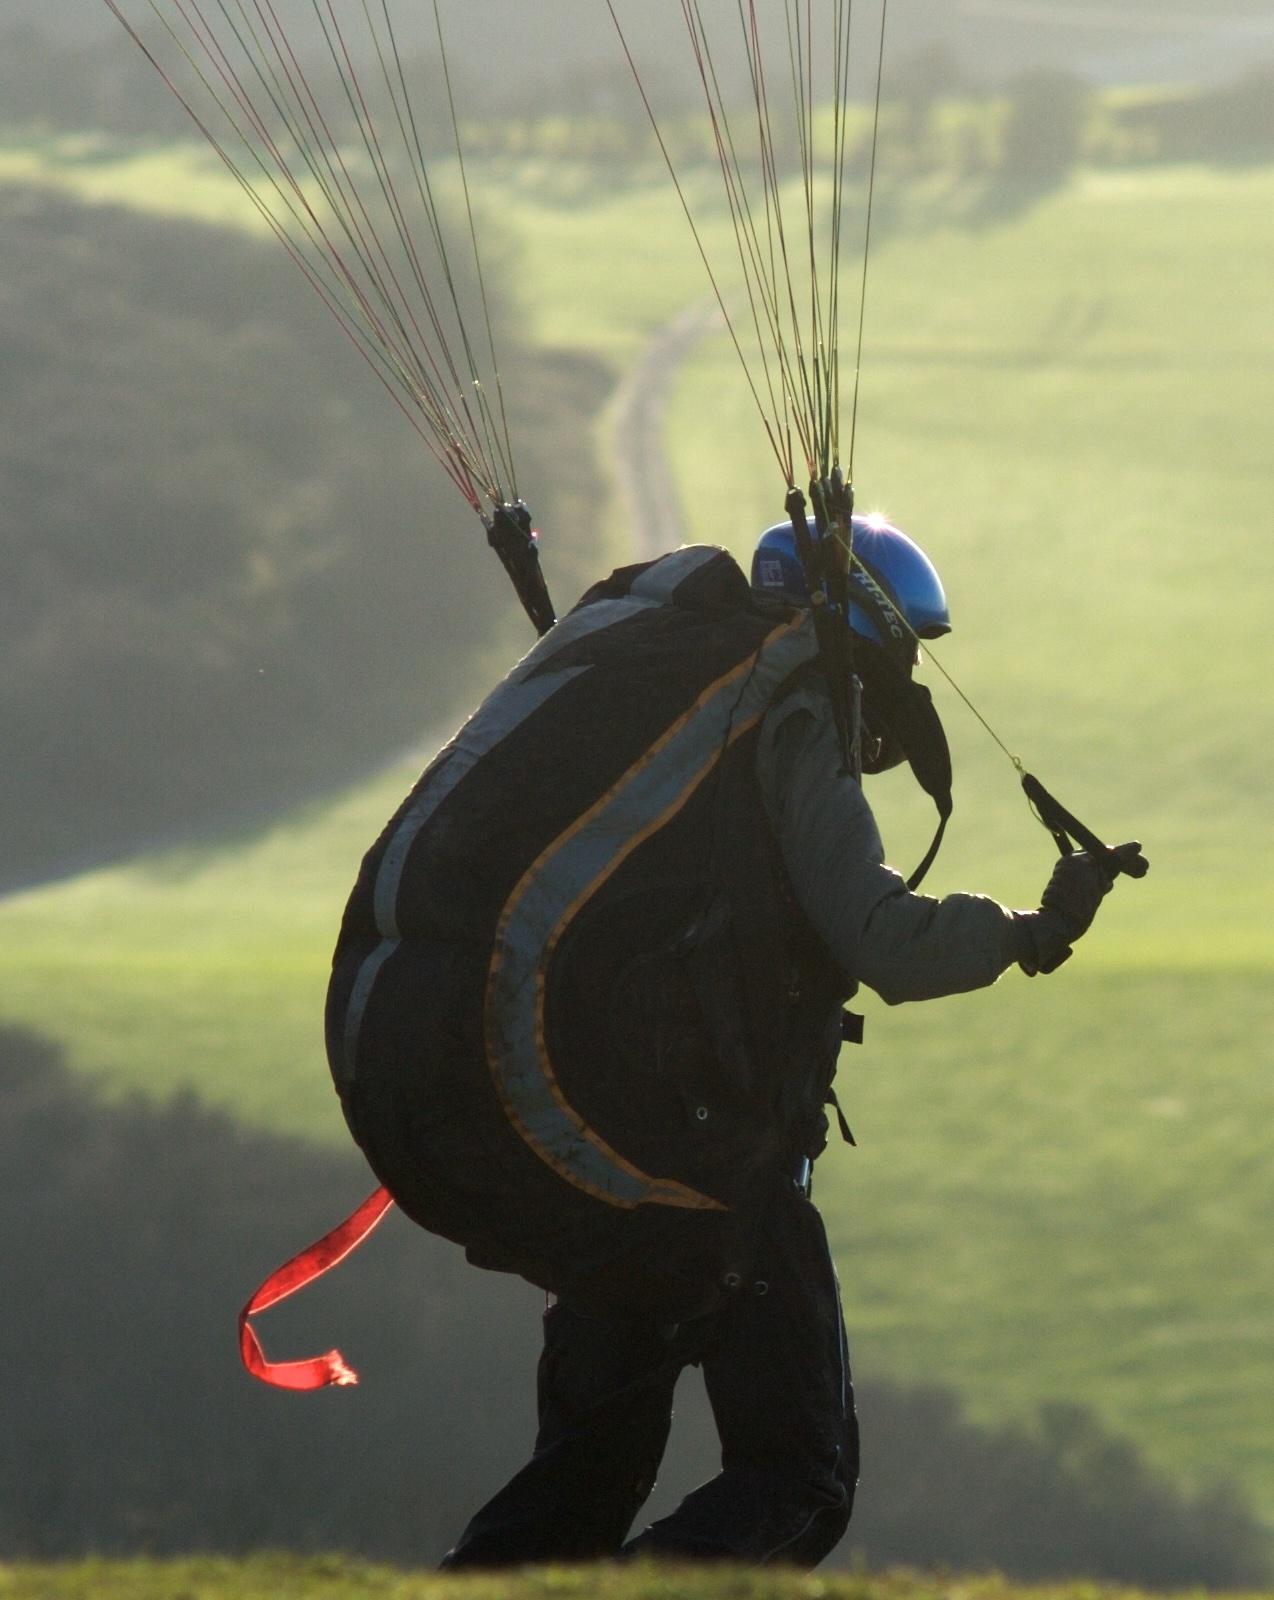 Learner Paaraglider Pilots Takes Off